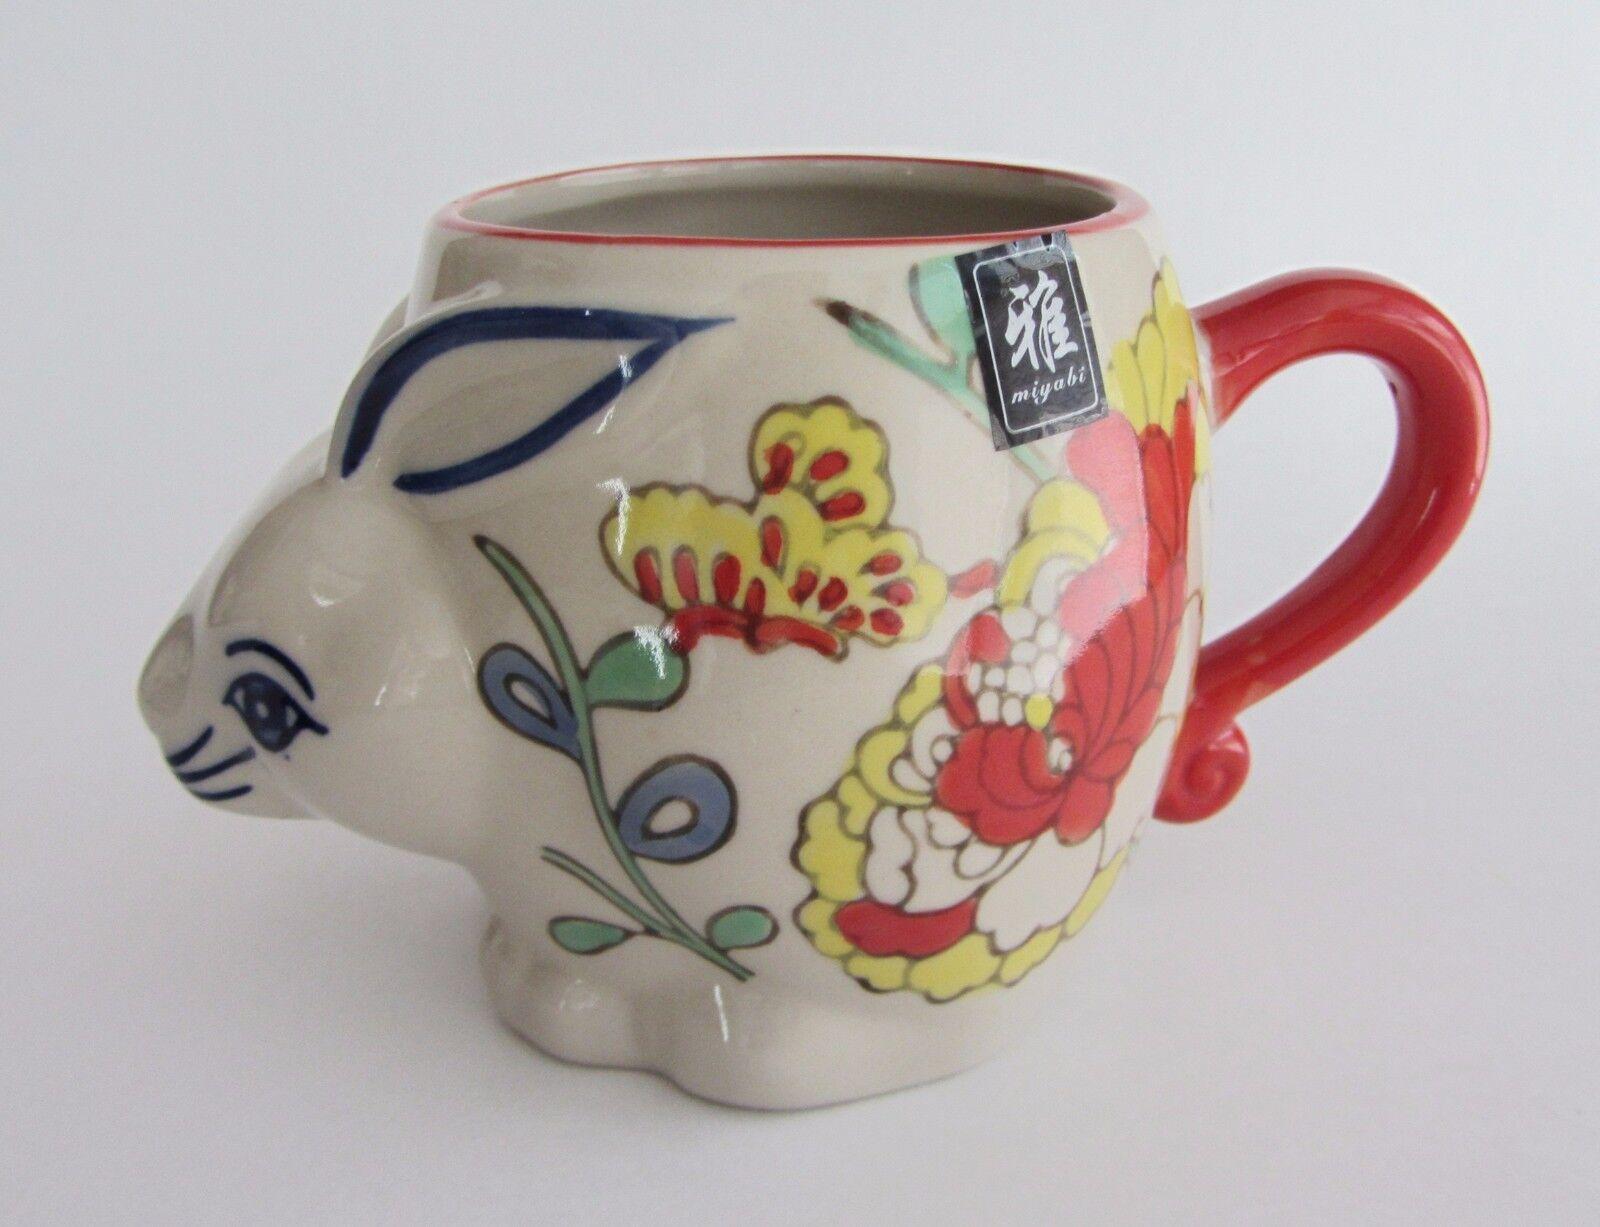 3 x Couleurful Yokohama Studio Miyabi Hand Painted 3D Coffee Mug Cup Rabbit Bunny